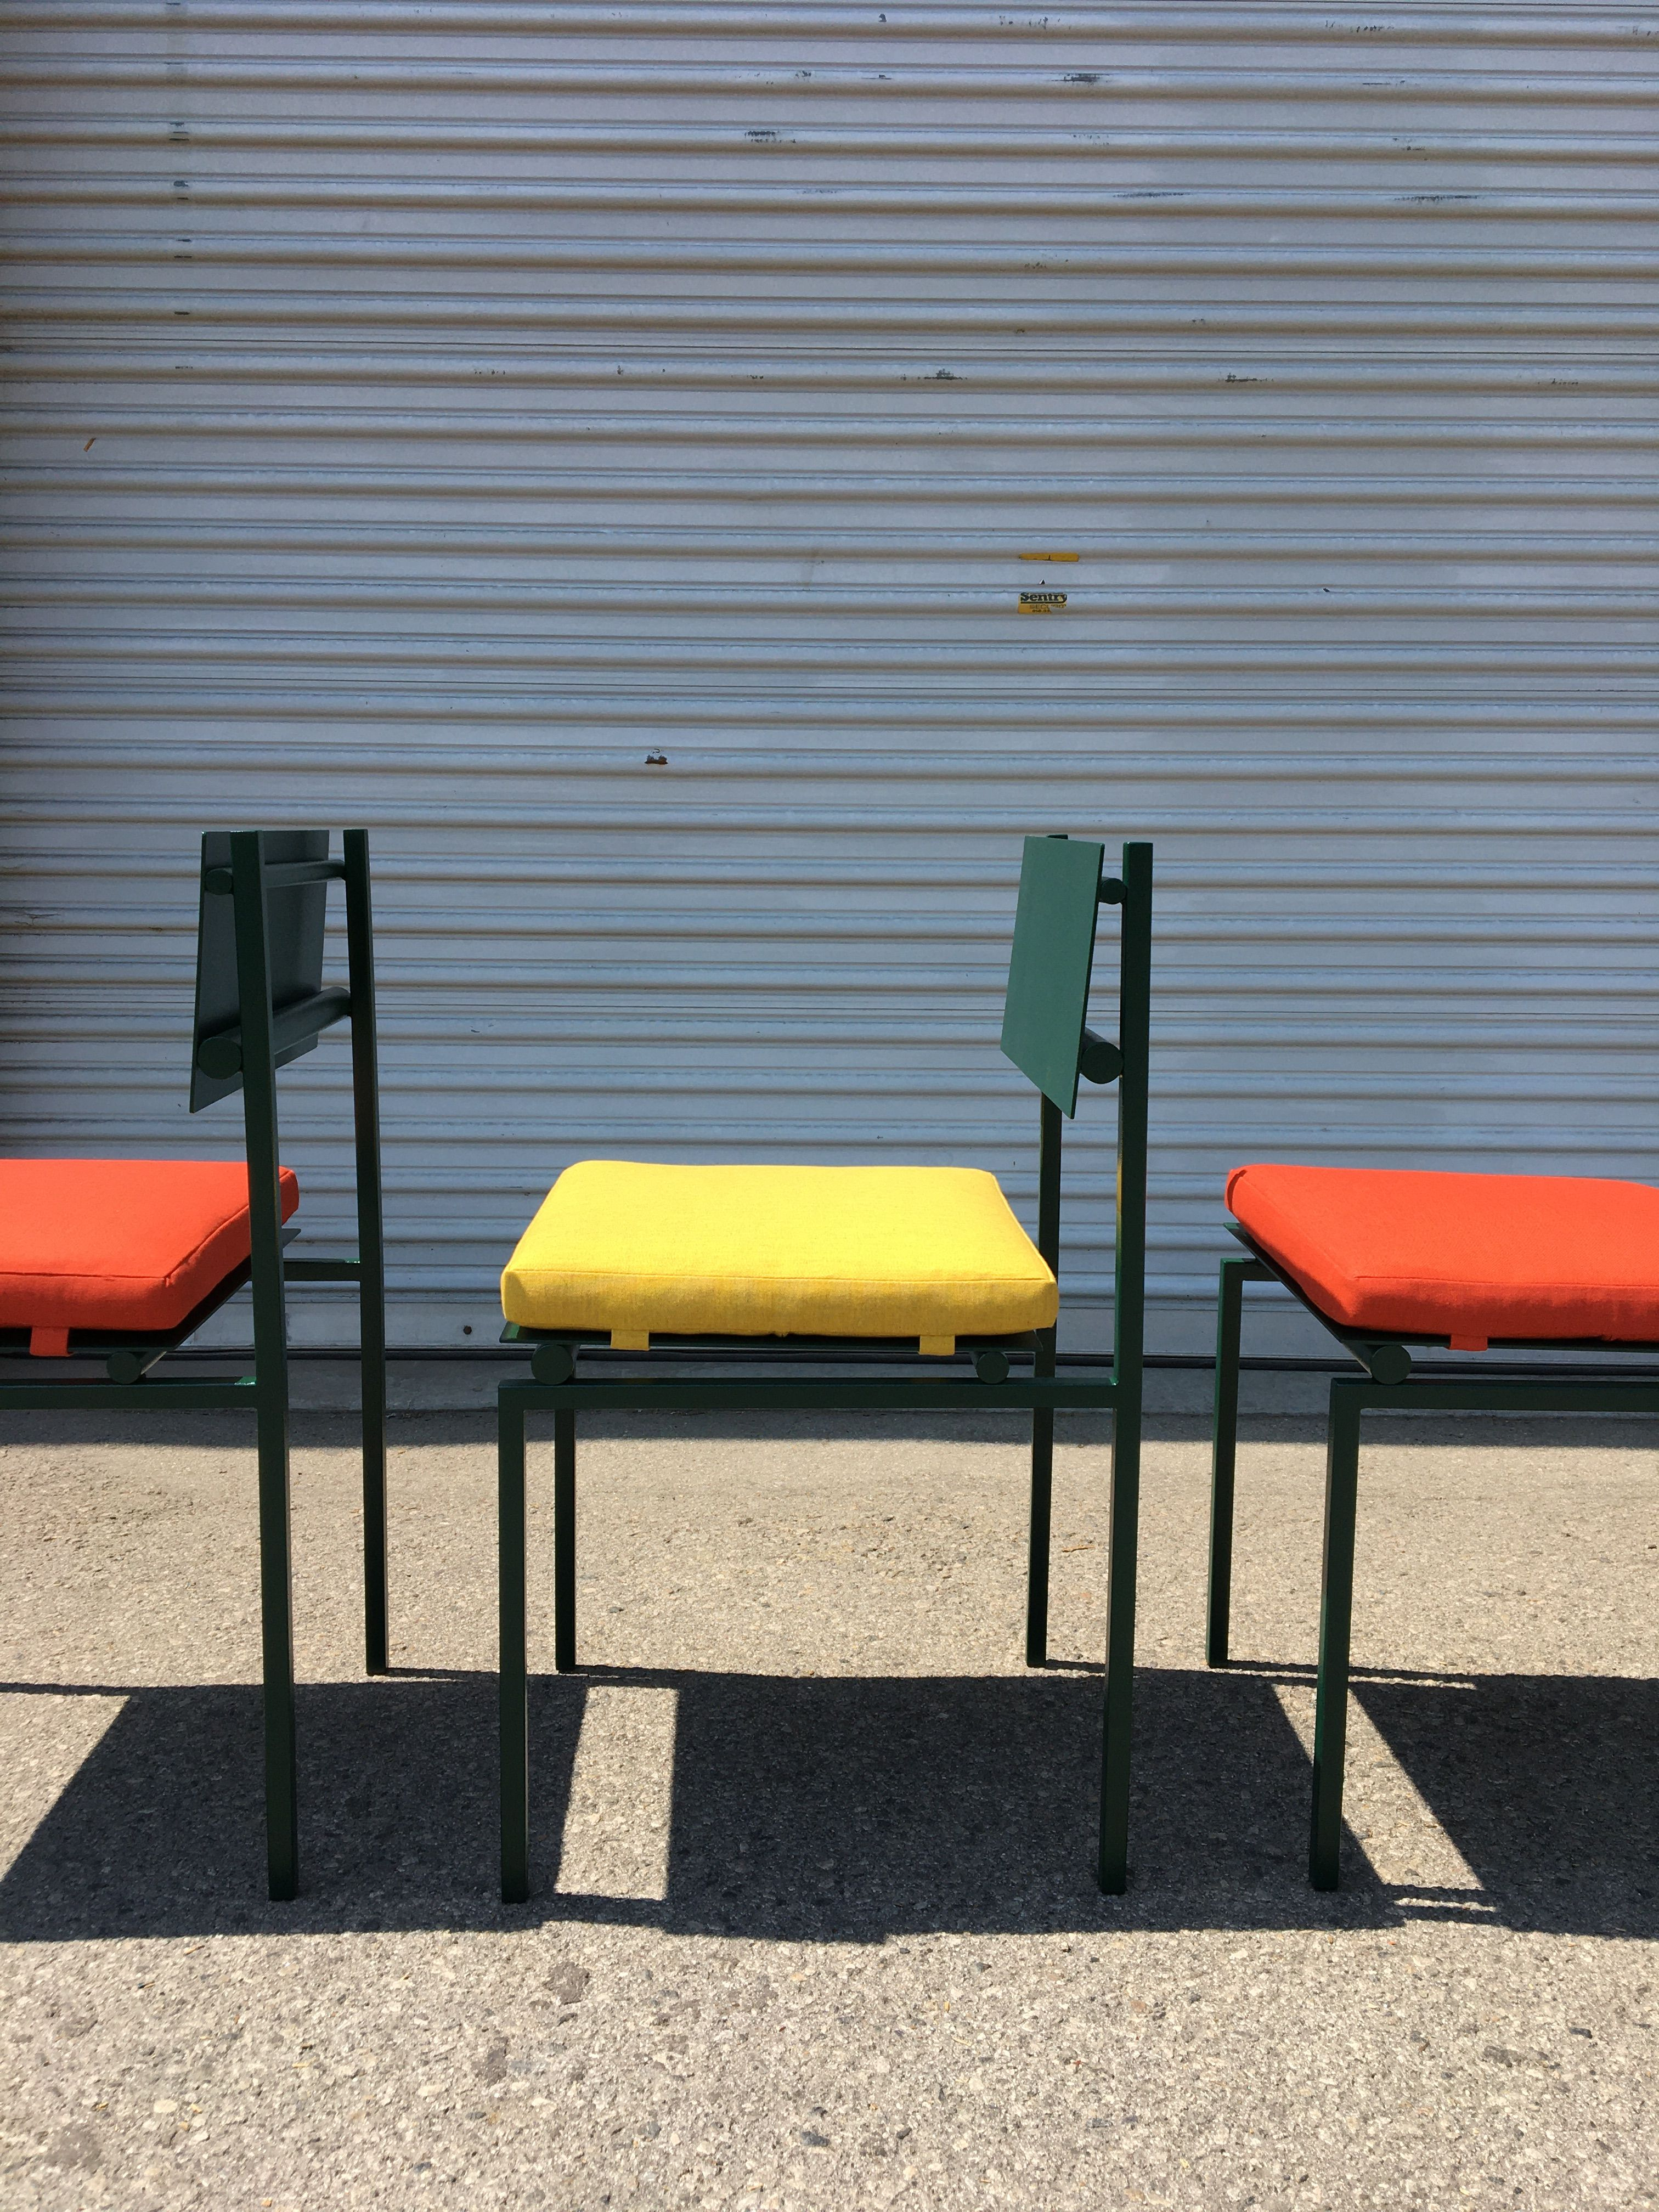 Suspension Metal Set - Breakfast Size product image 22